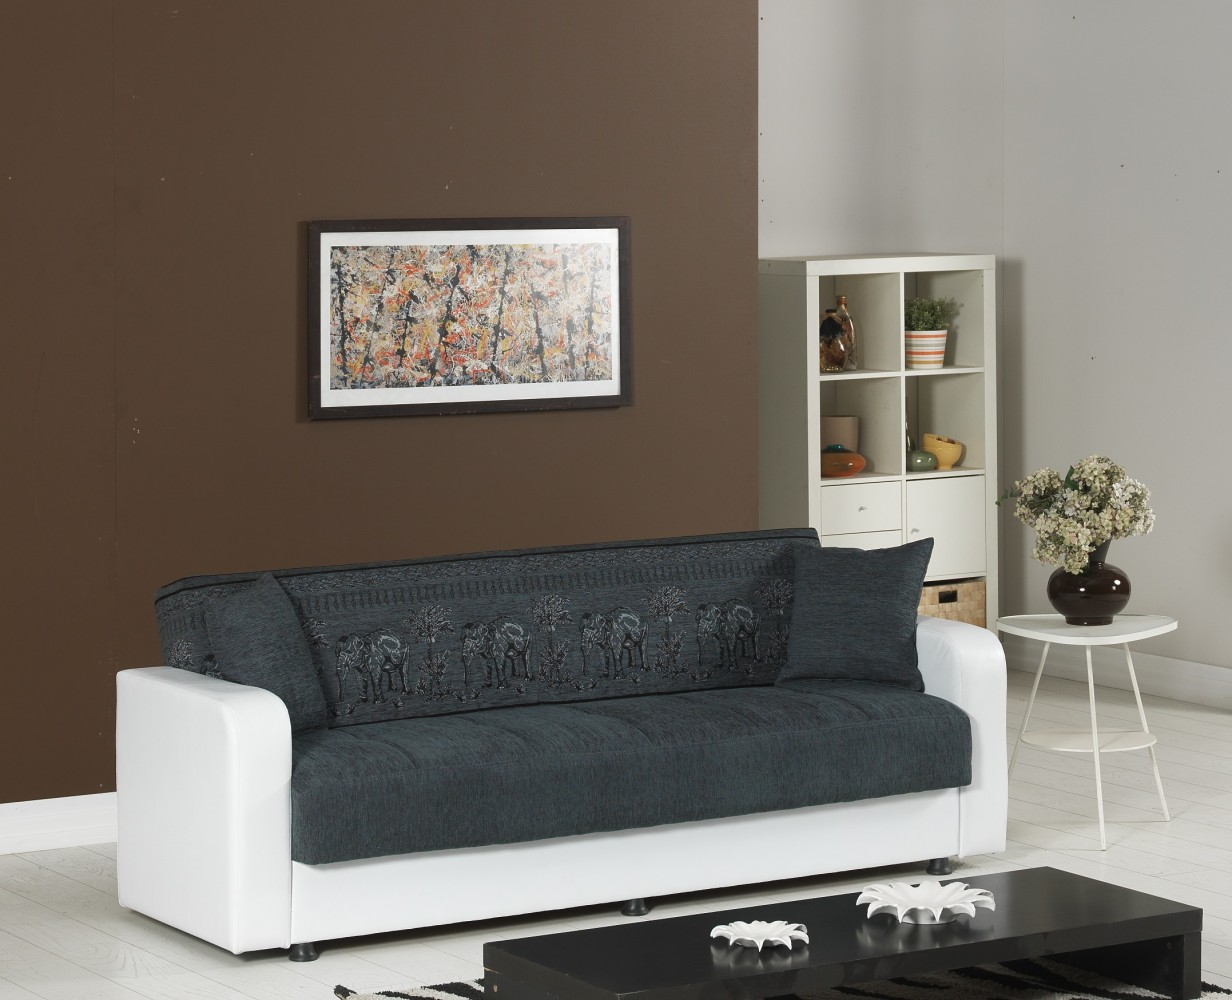 modernes funktionssofa kippsofa schlafsofa sofa. Black Bedroom Furniture Sets. Home Design Ideas